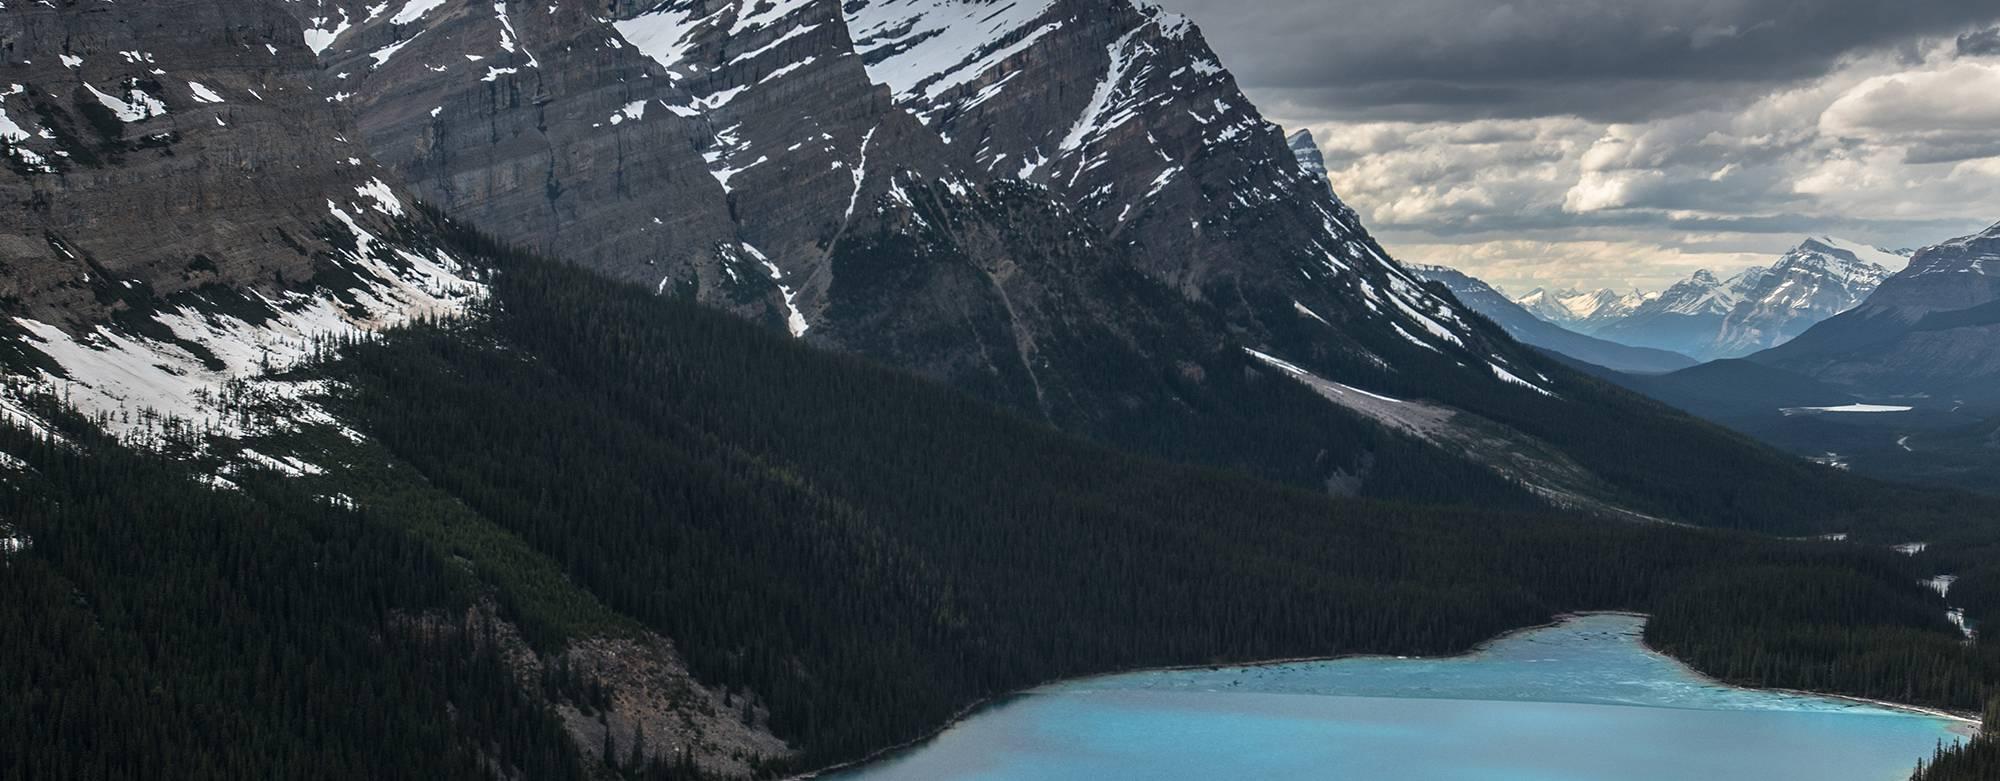 virmuze exhibit Canadian Rockies logo main banner